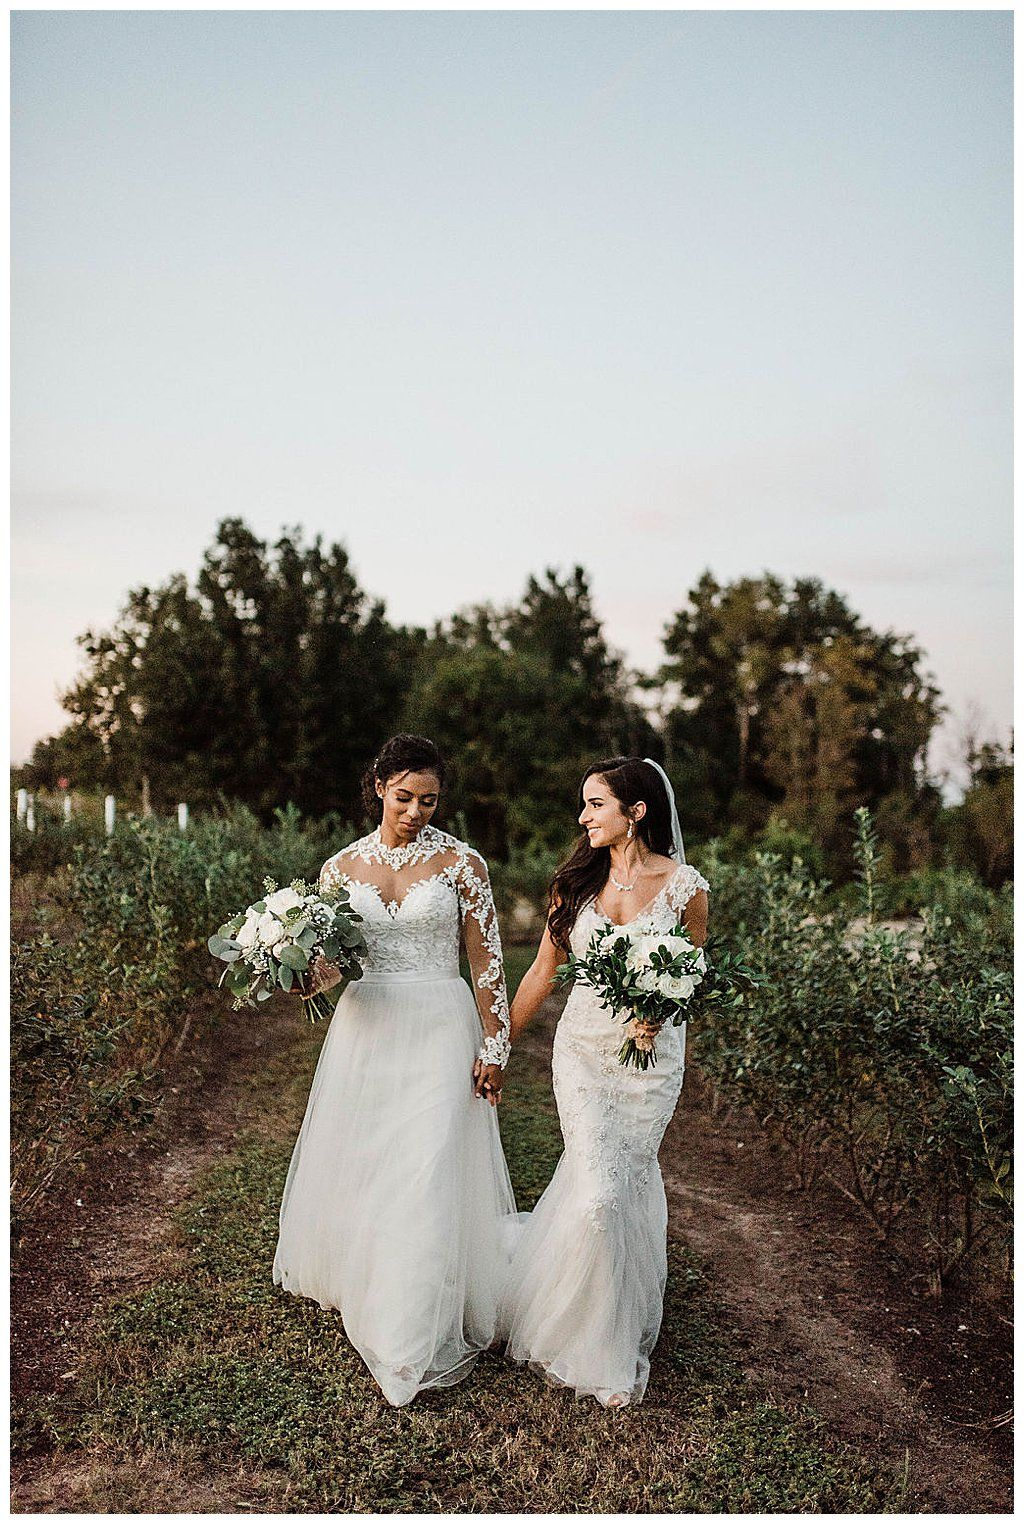 A Winery Wedding with a Modern Botanical Theme - Love Inc. Mag